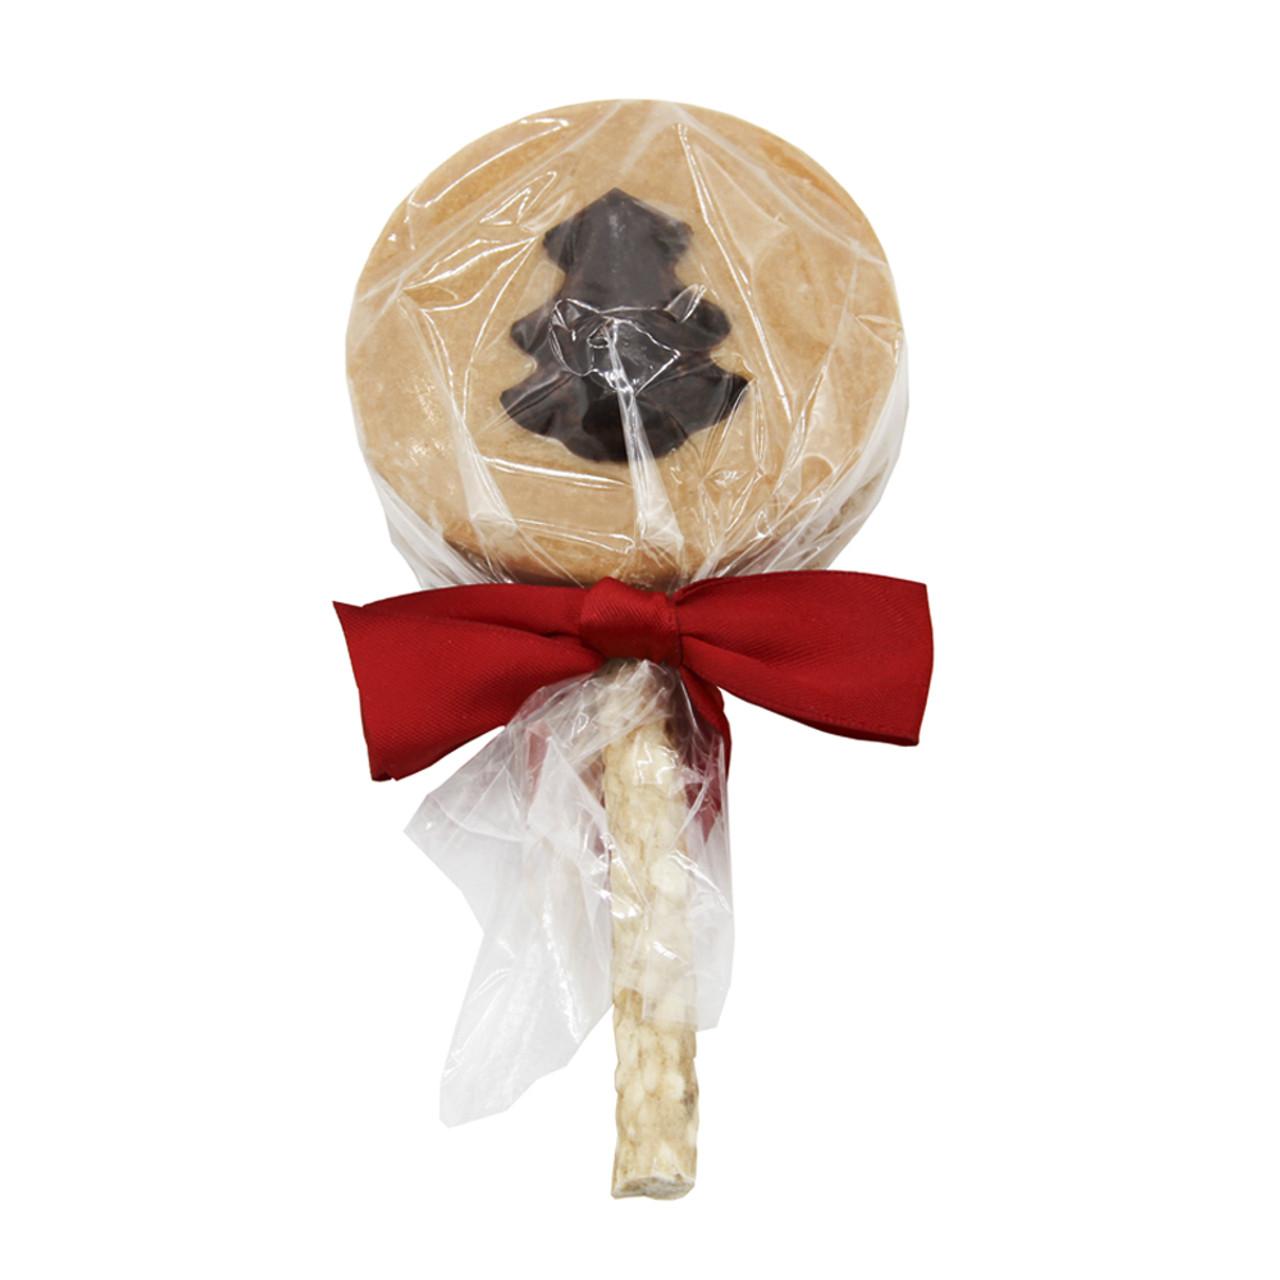 Claudia's Christmas Carob Tree Peanut Butter Lollipop Dog Treat